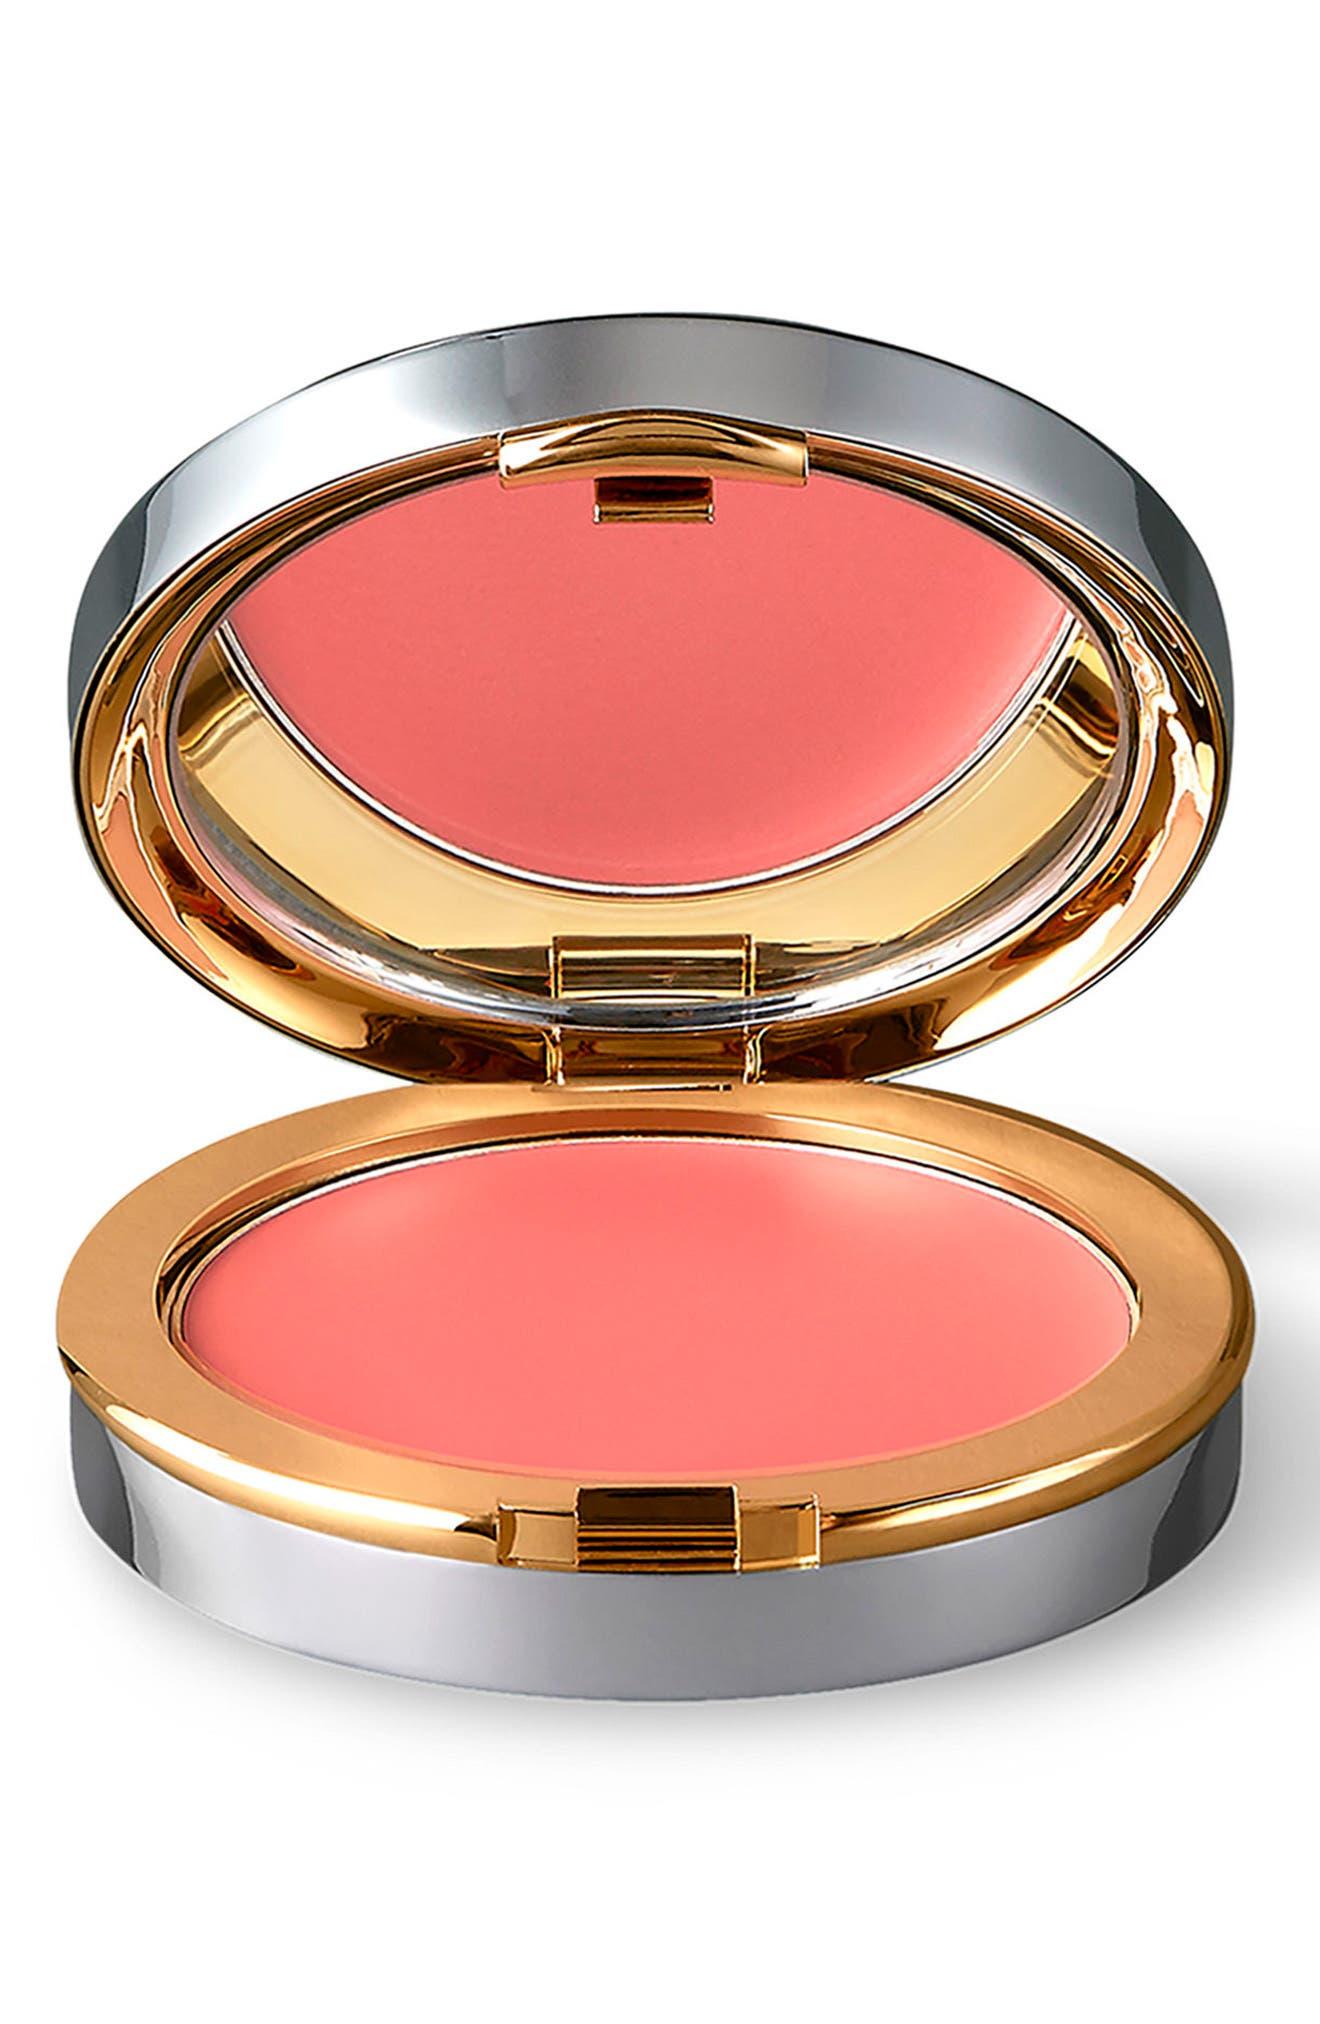 La Prairie Cellular Radiance Cream Blush